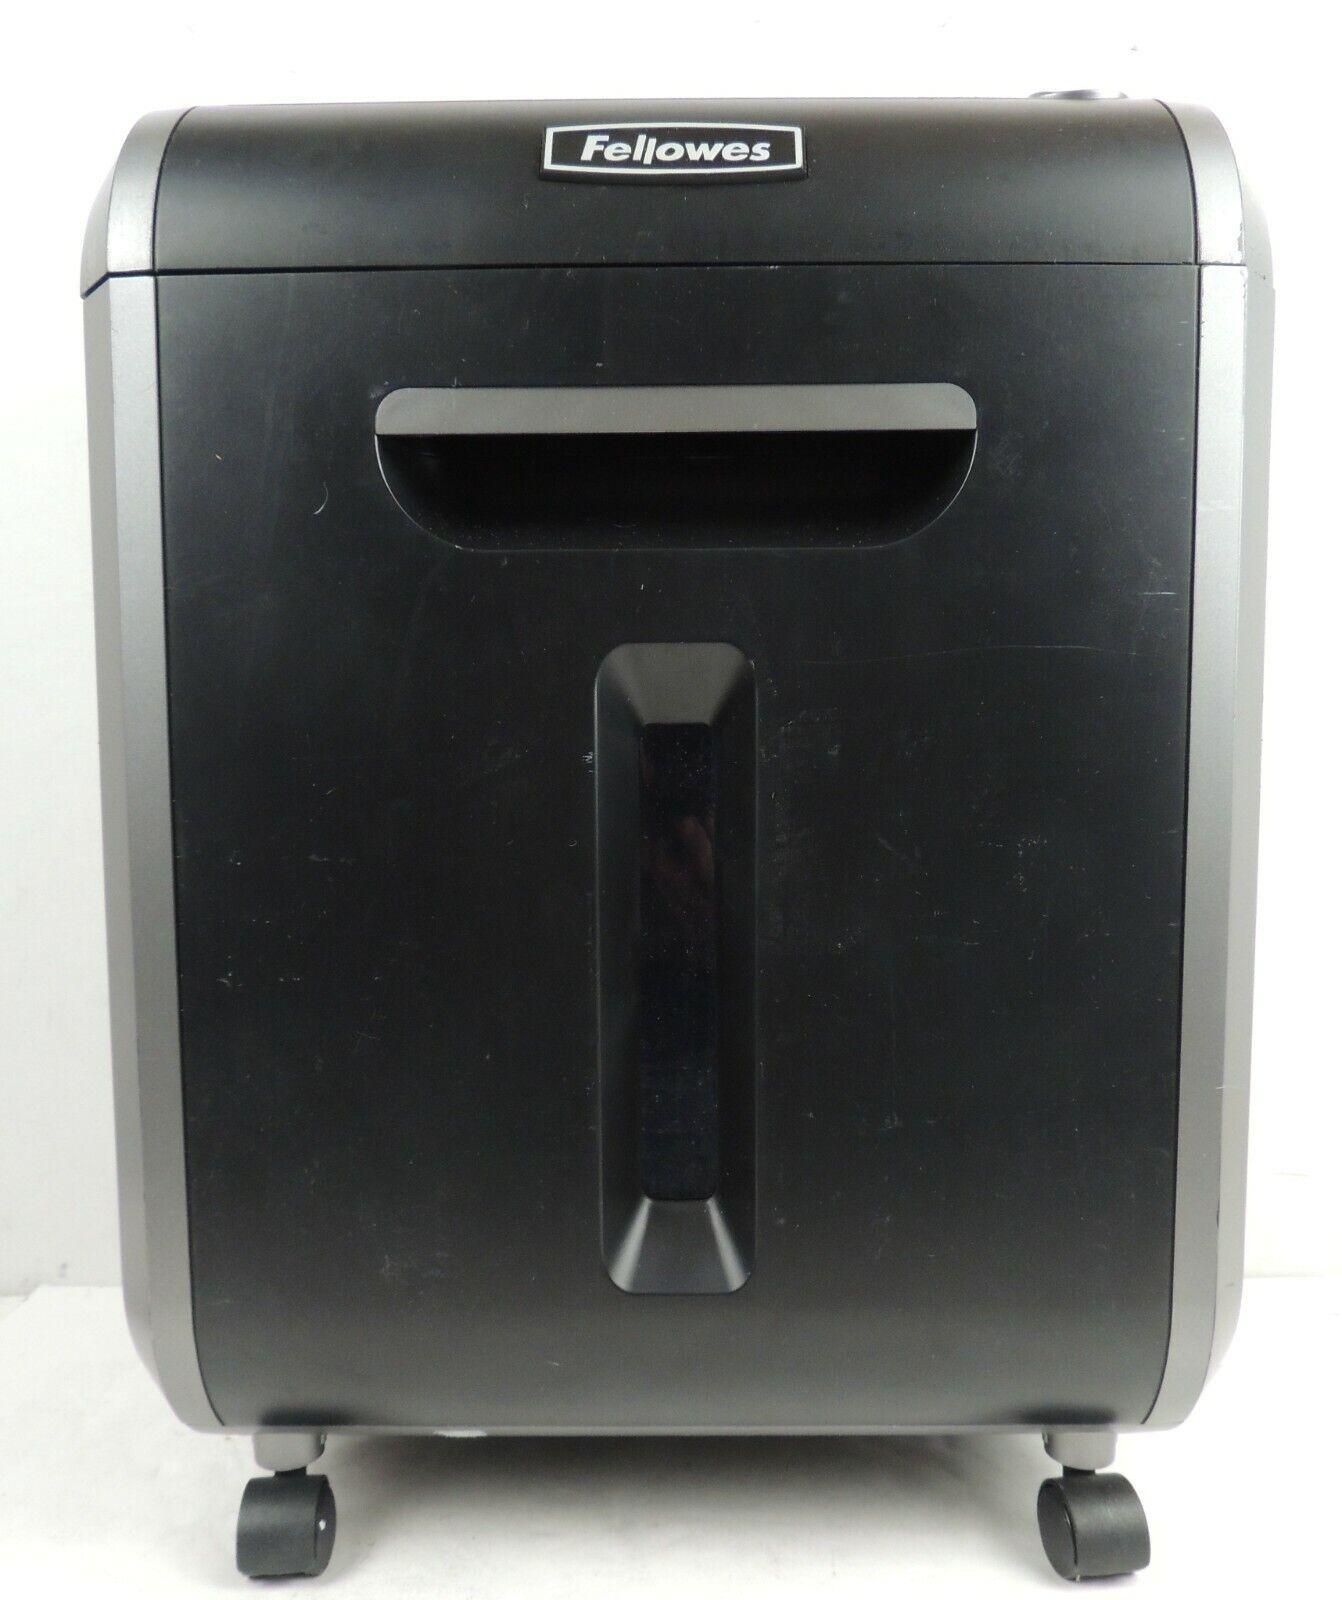 Fellowes Powershred 79Ci Shredder 100 Jam Proof, Cross Cut 16 Sheet Capacity - $164.99